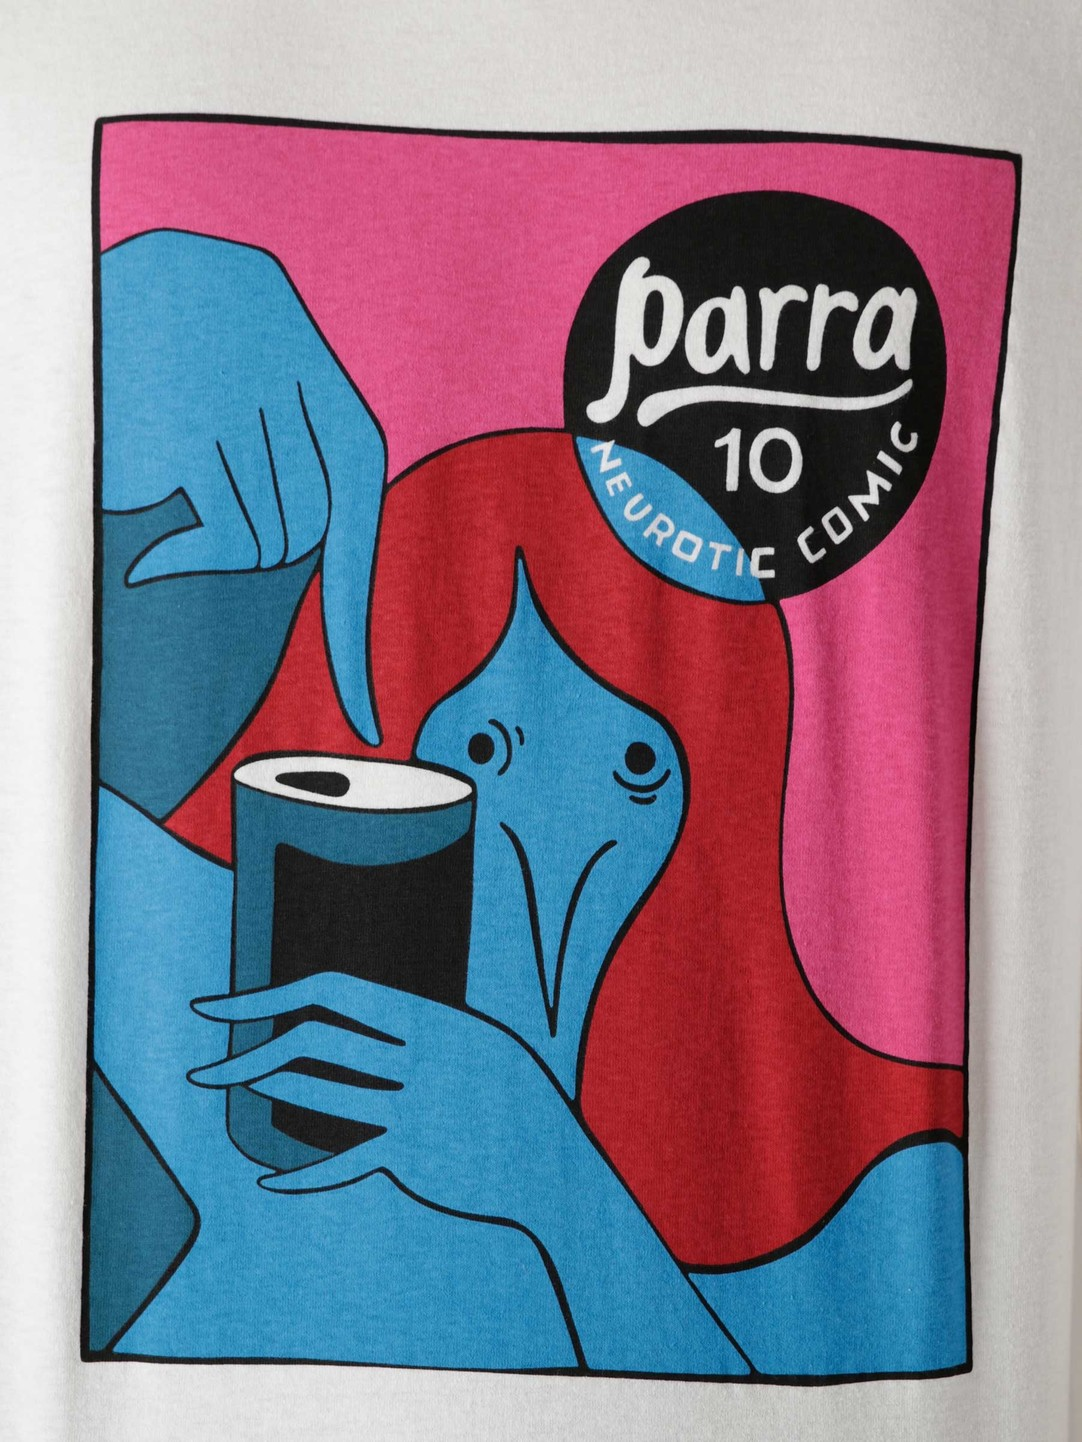 by Parra by Parra Neurotic Comic T-Shirt White 45450